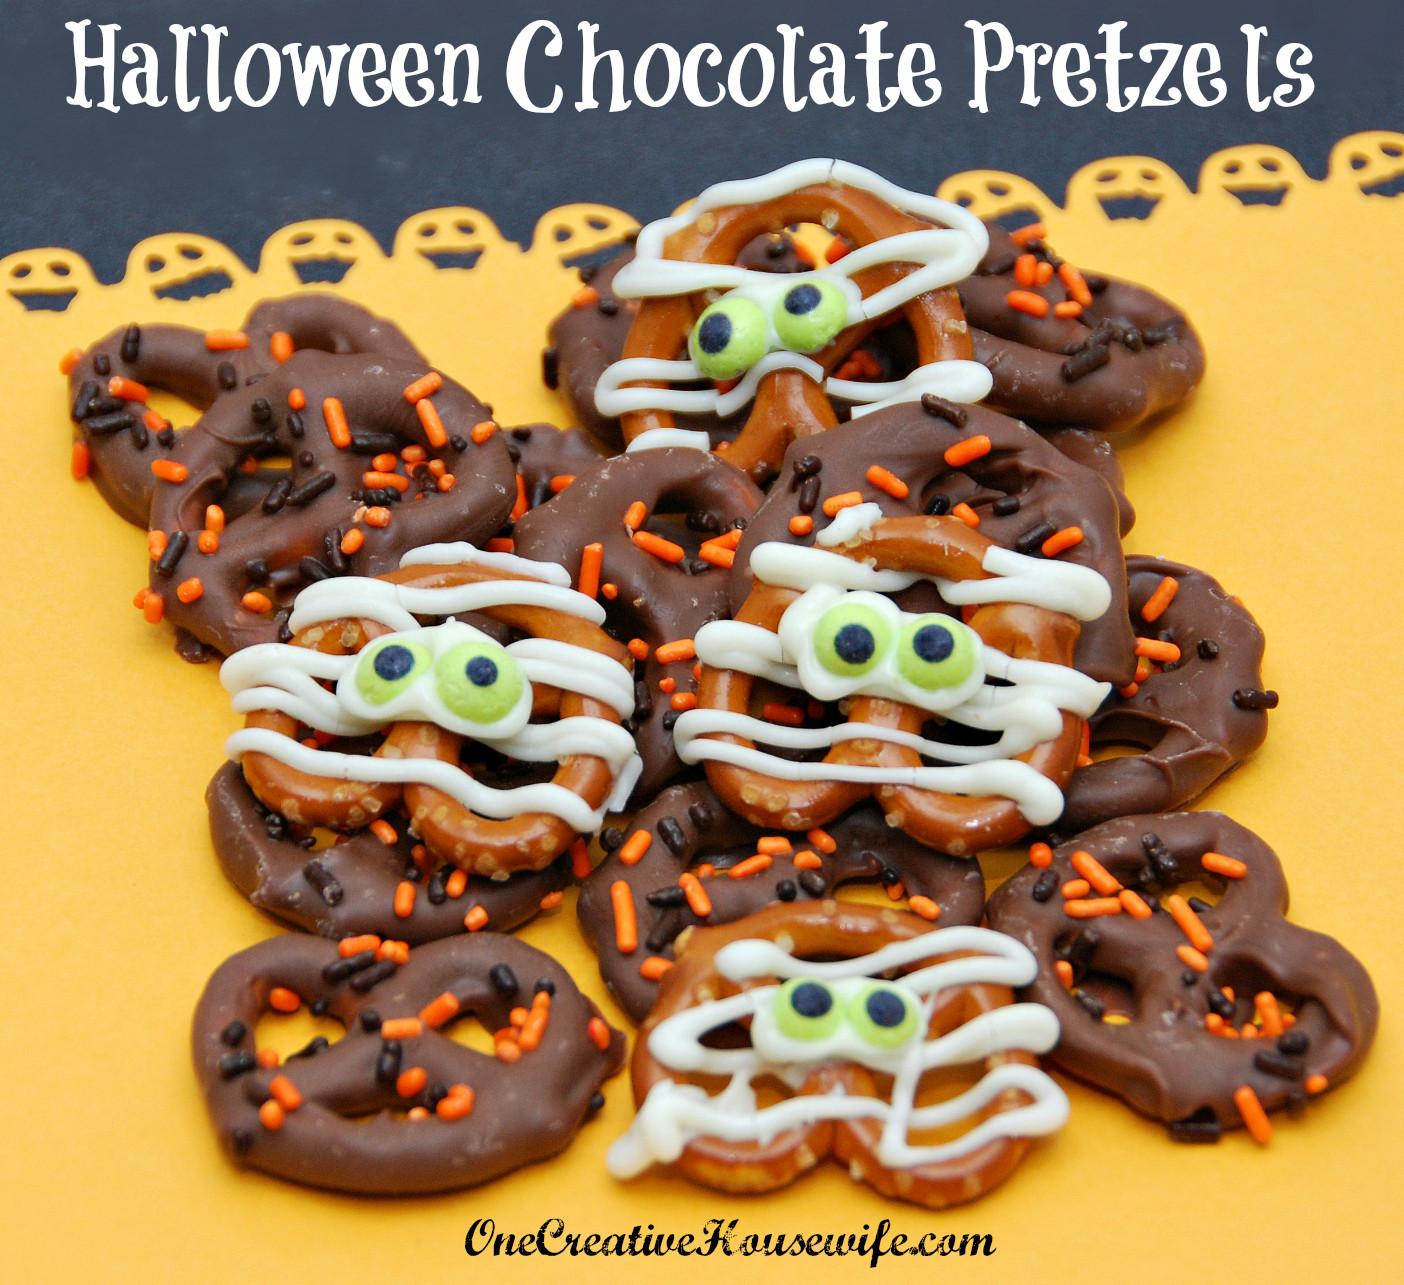 Halloween Pretzels Treats  e Creative Housewife Halloween Chocolate Covered Pretzels